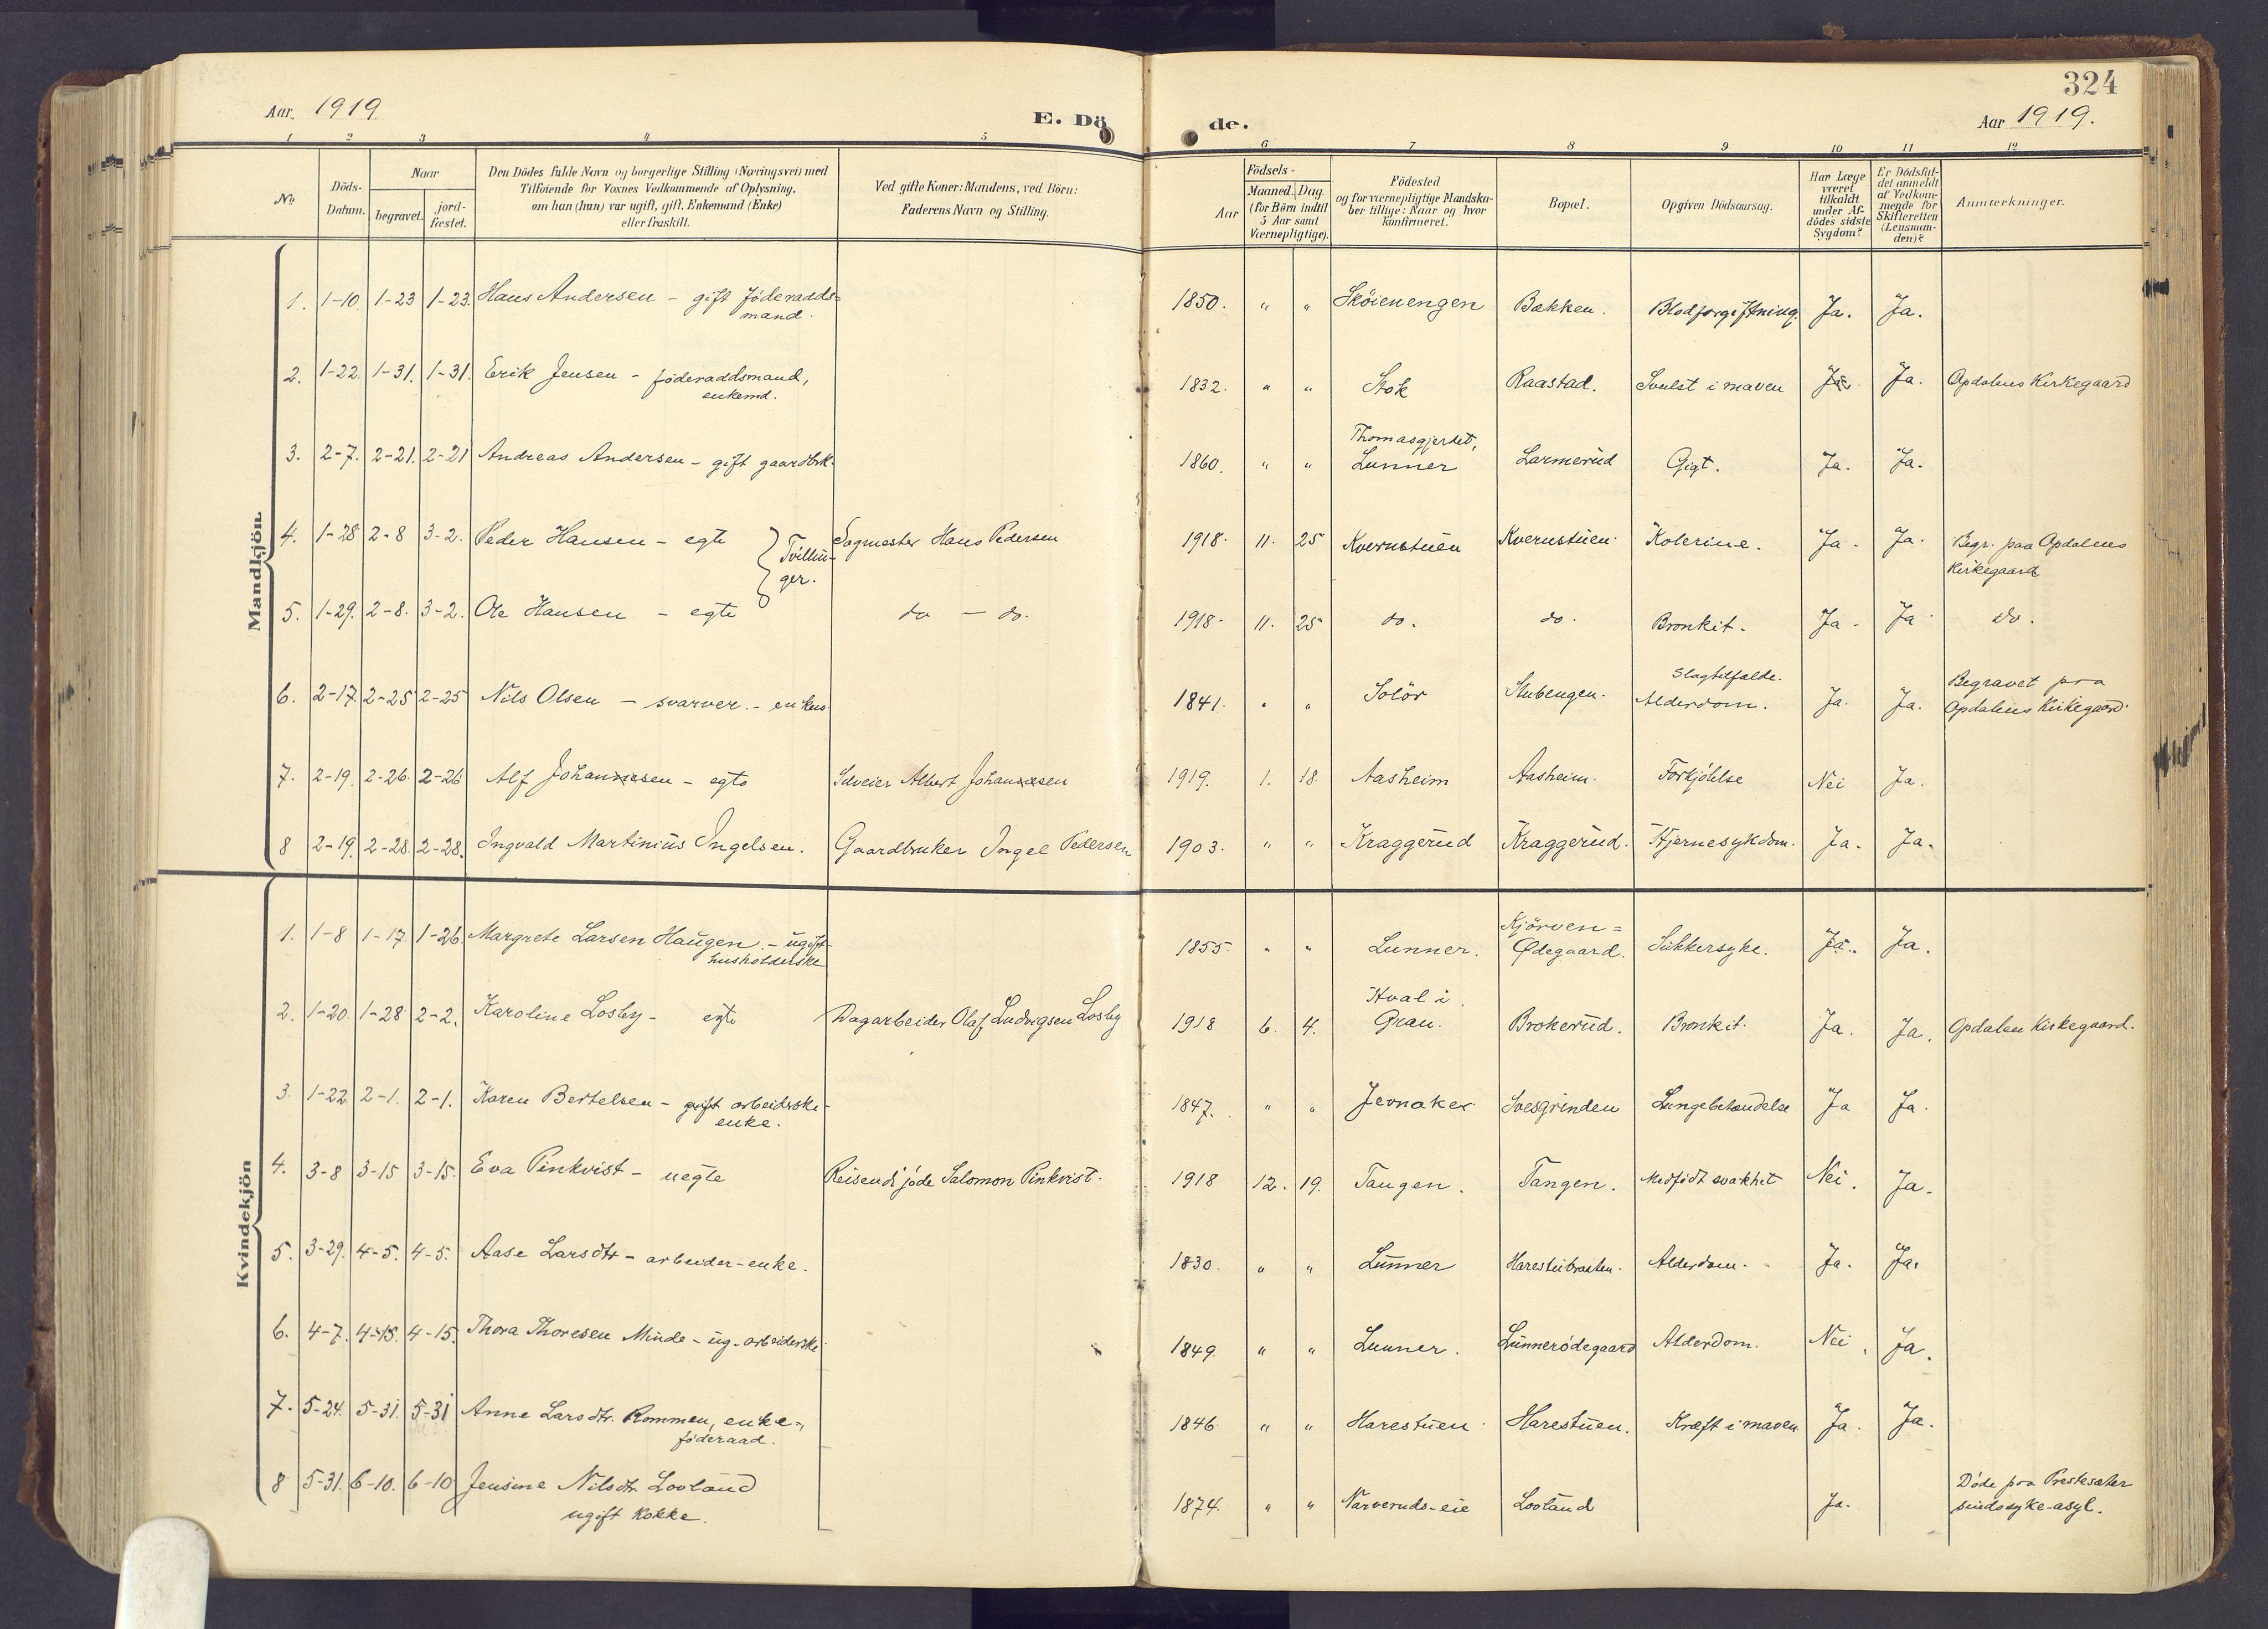 SAH, Lunner prestekontor, H/Ha/Haa/L0001: Ministerialbok nr. 1, 1907-1922, s. 324